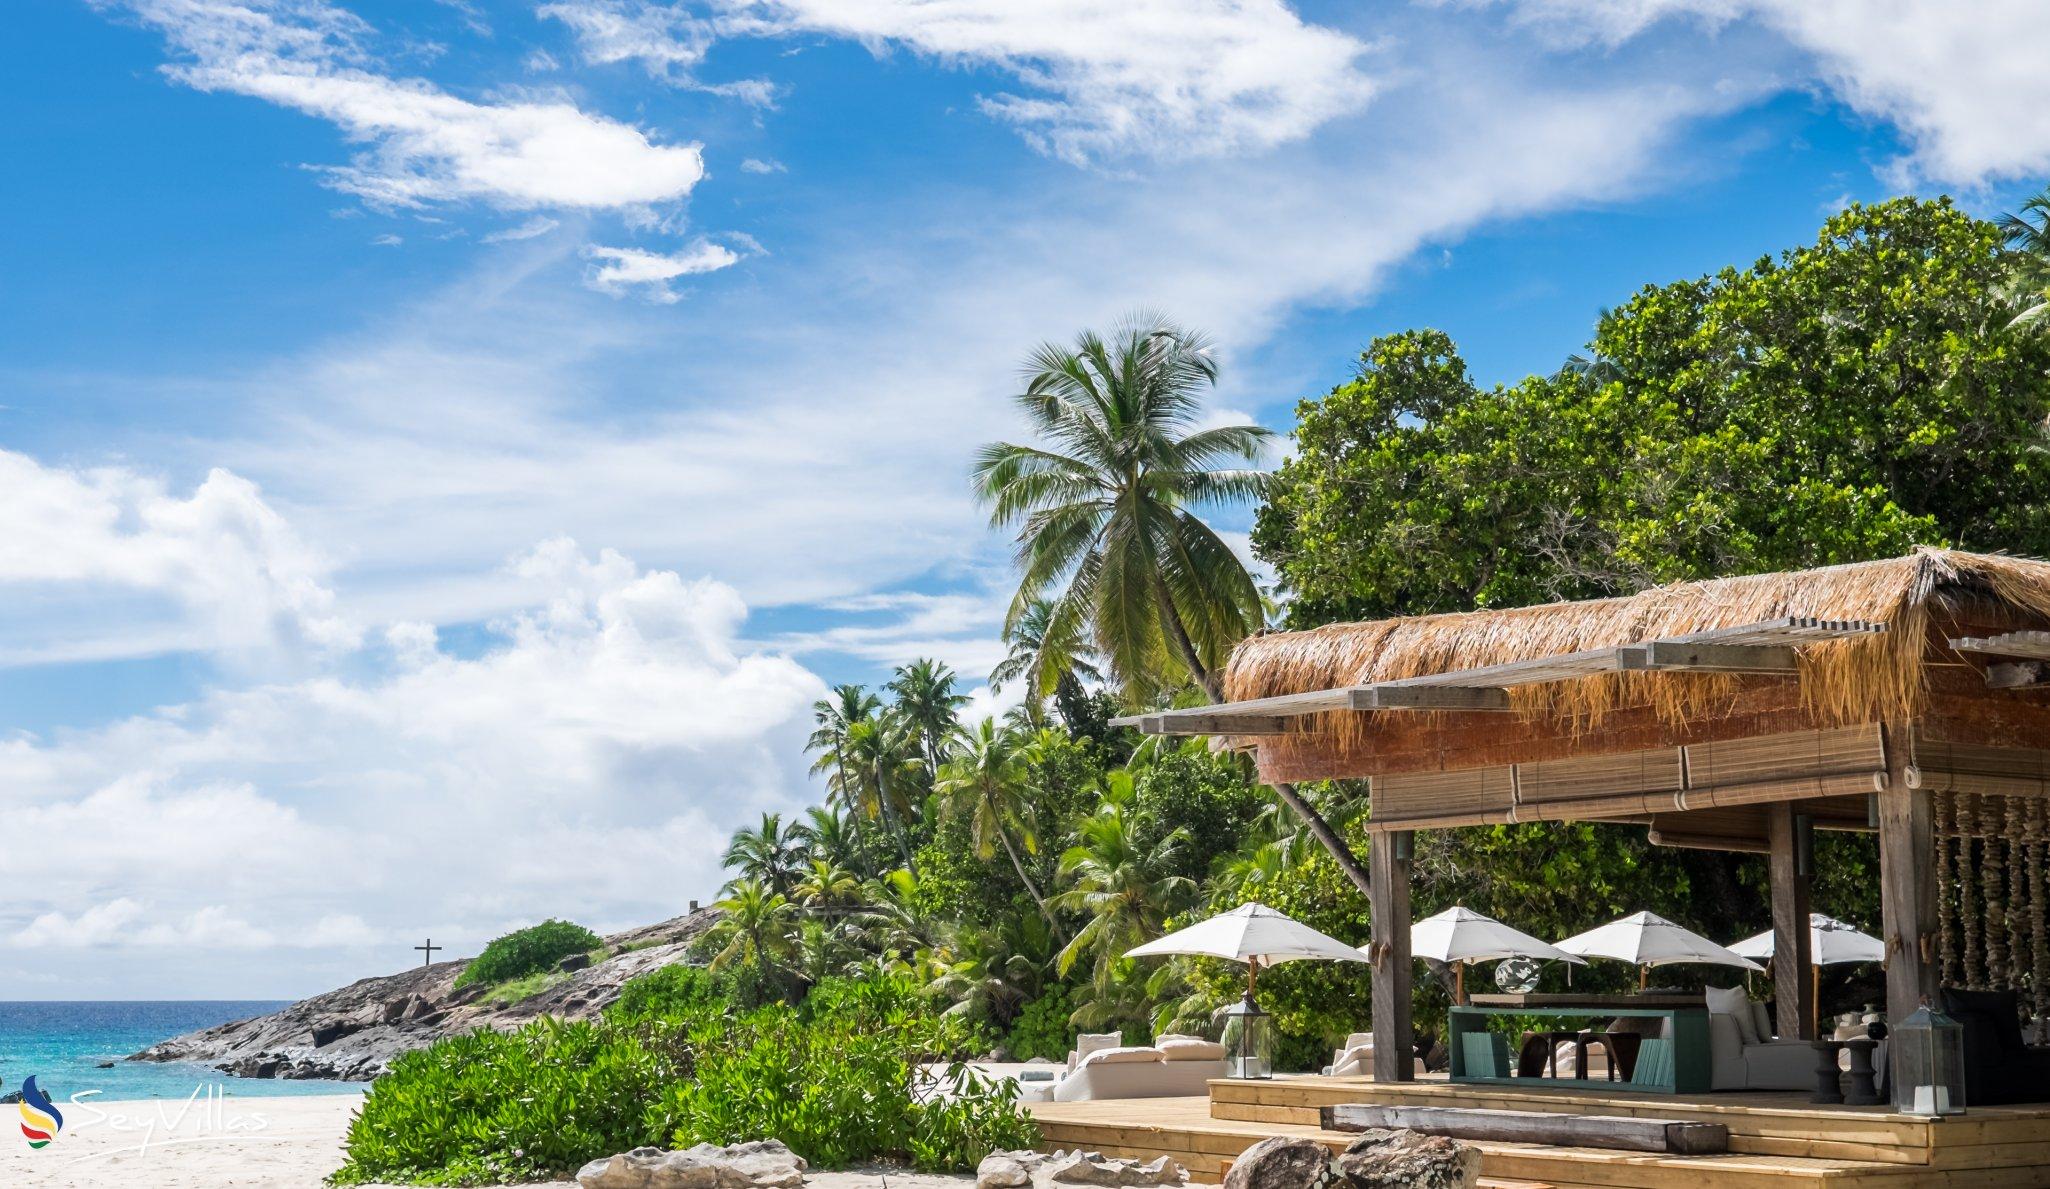 resort north island lodge auf north island seychellen. Black Bedroom Furniture Sets. Home Design Ideas